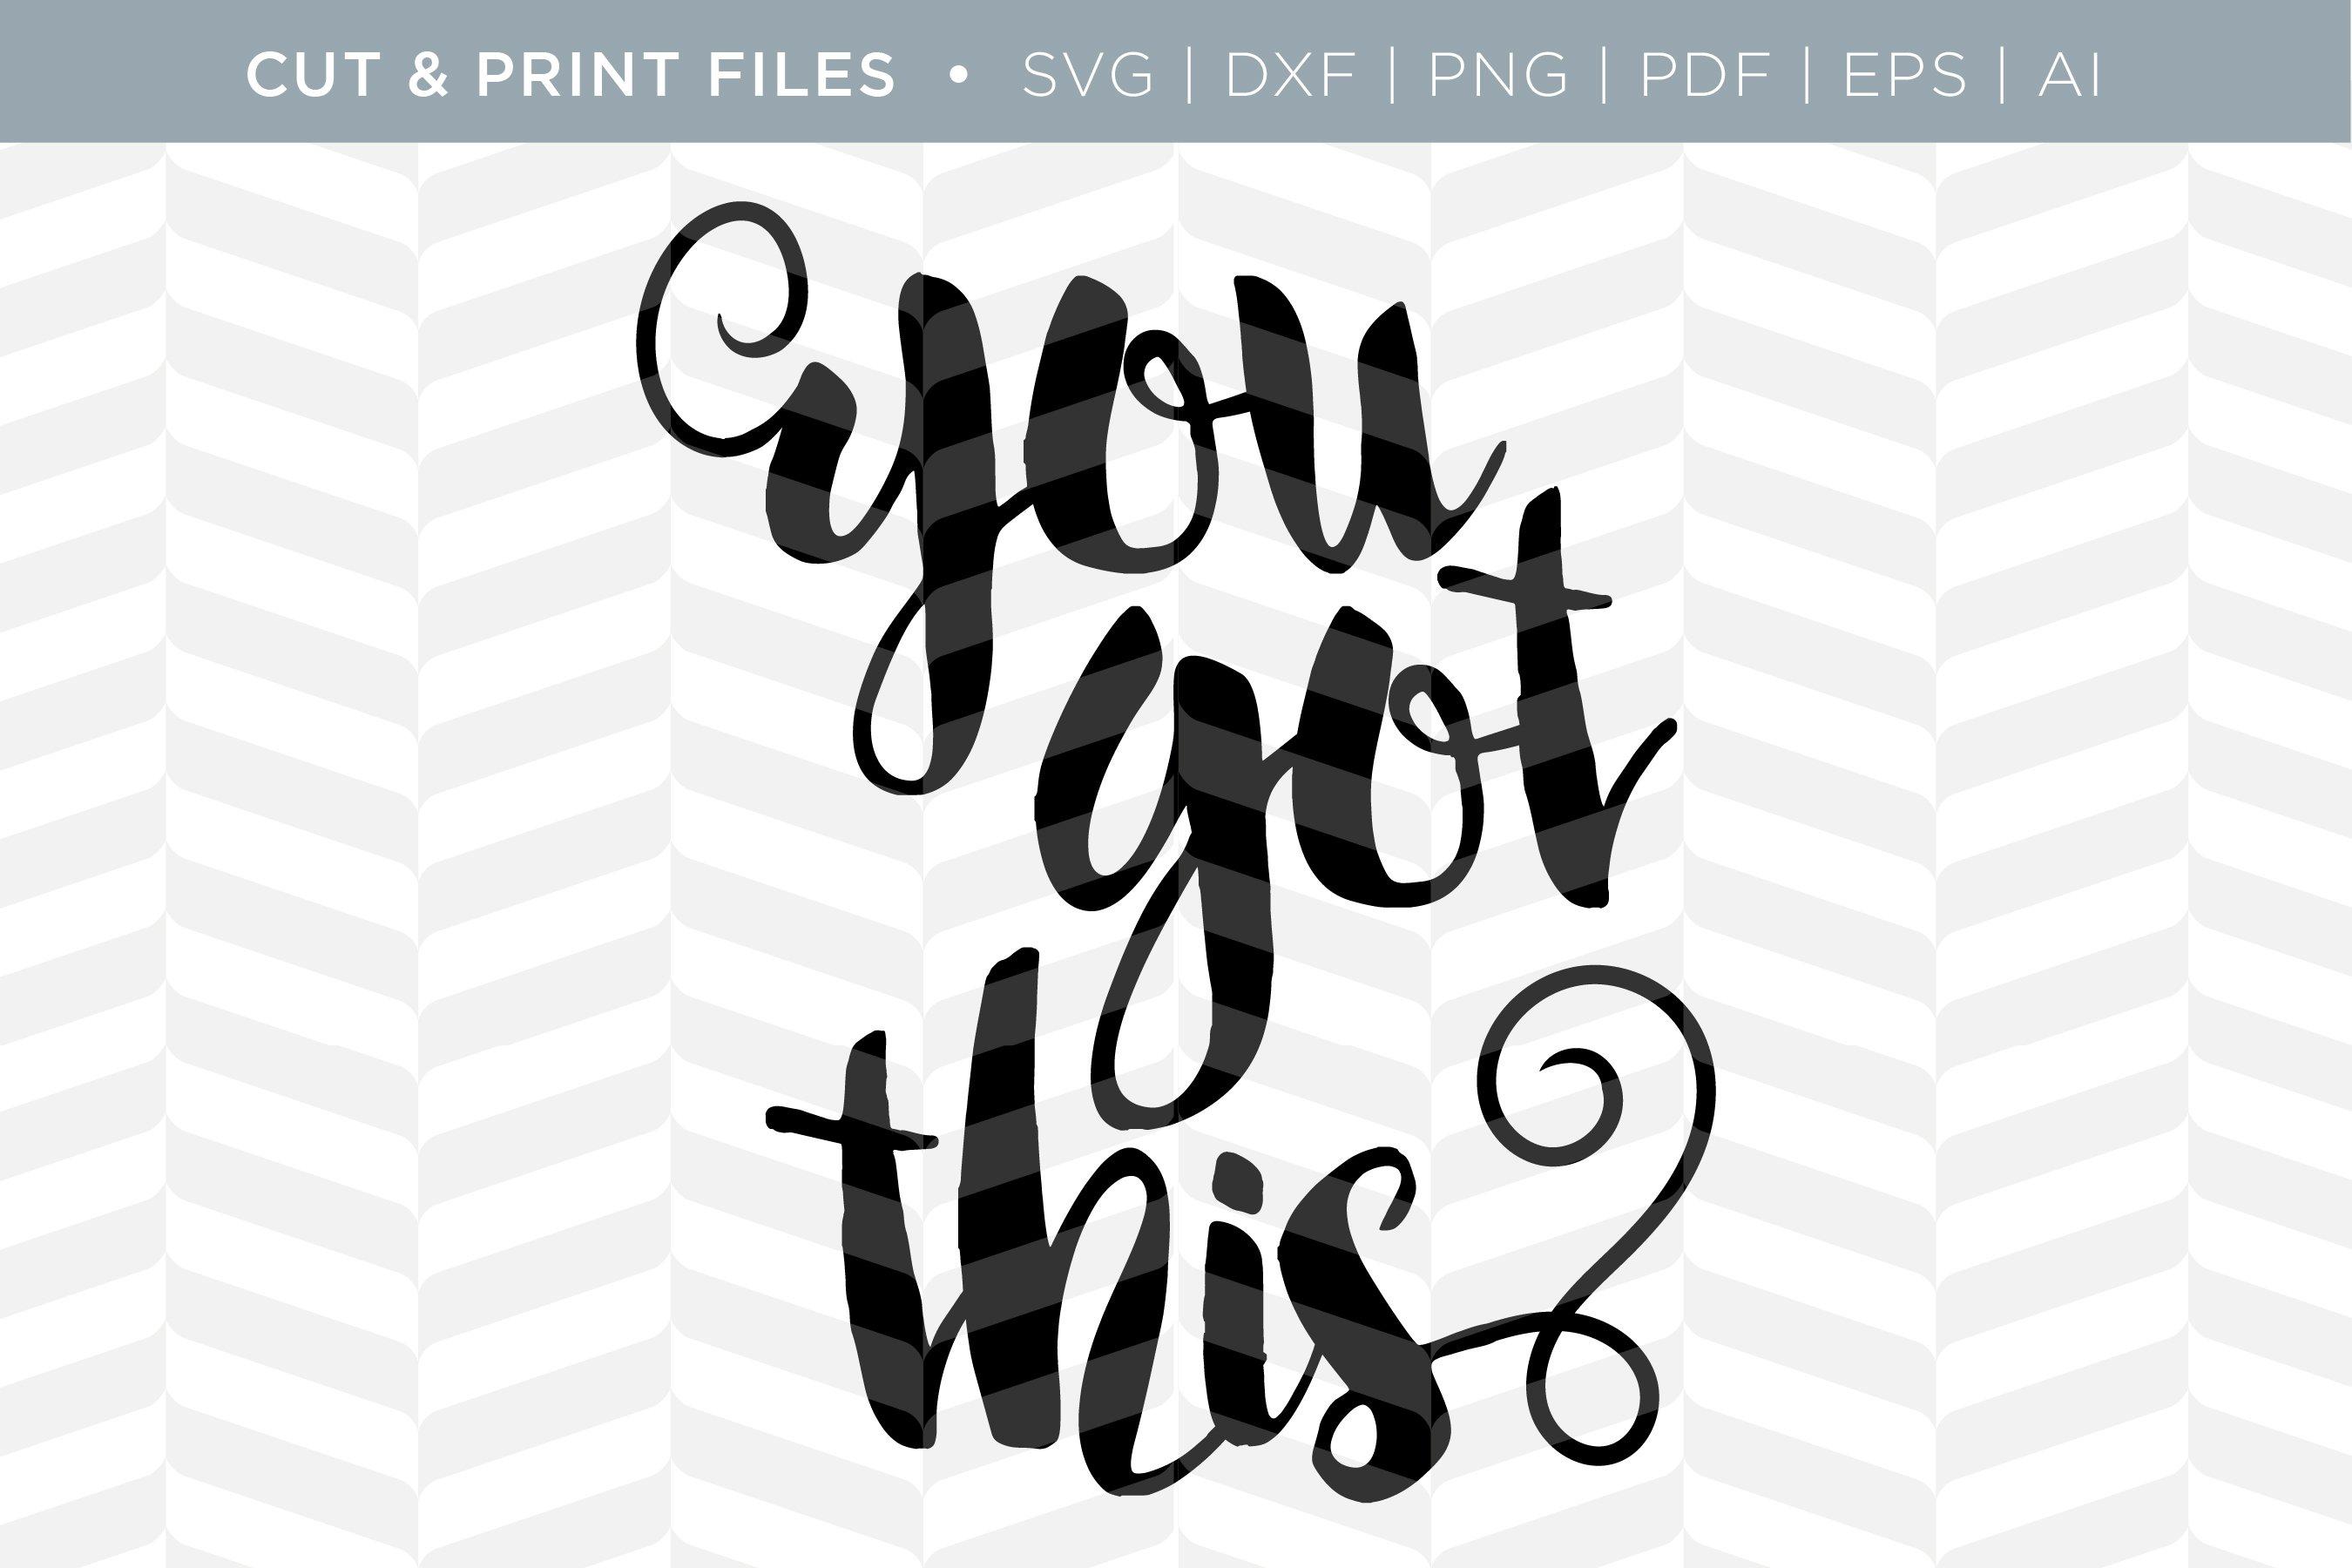 You Got This Svg Cut Print File Pre Designed Illustrator Graphics Creative Market